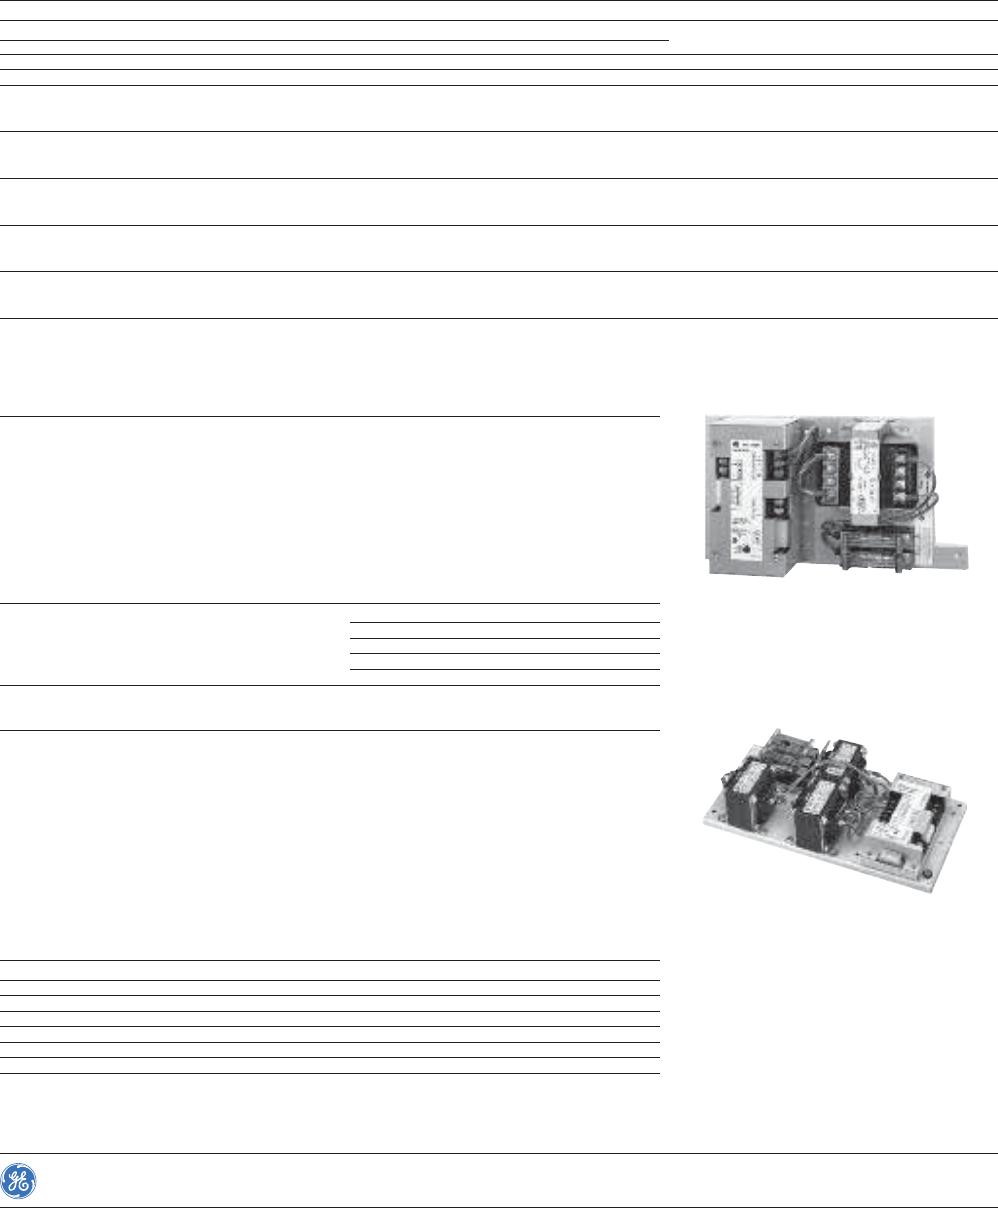 Ge Buylog Section 3 Brochure General Electric Circuit Breaker Ul489 D 3p 5a 240vac Geindustrialcom Rev 9 12